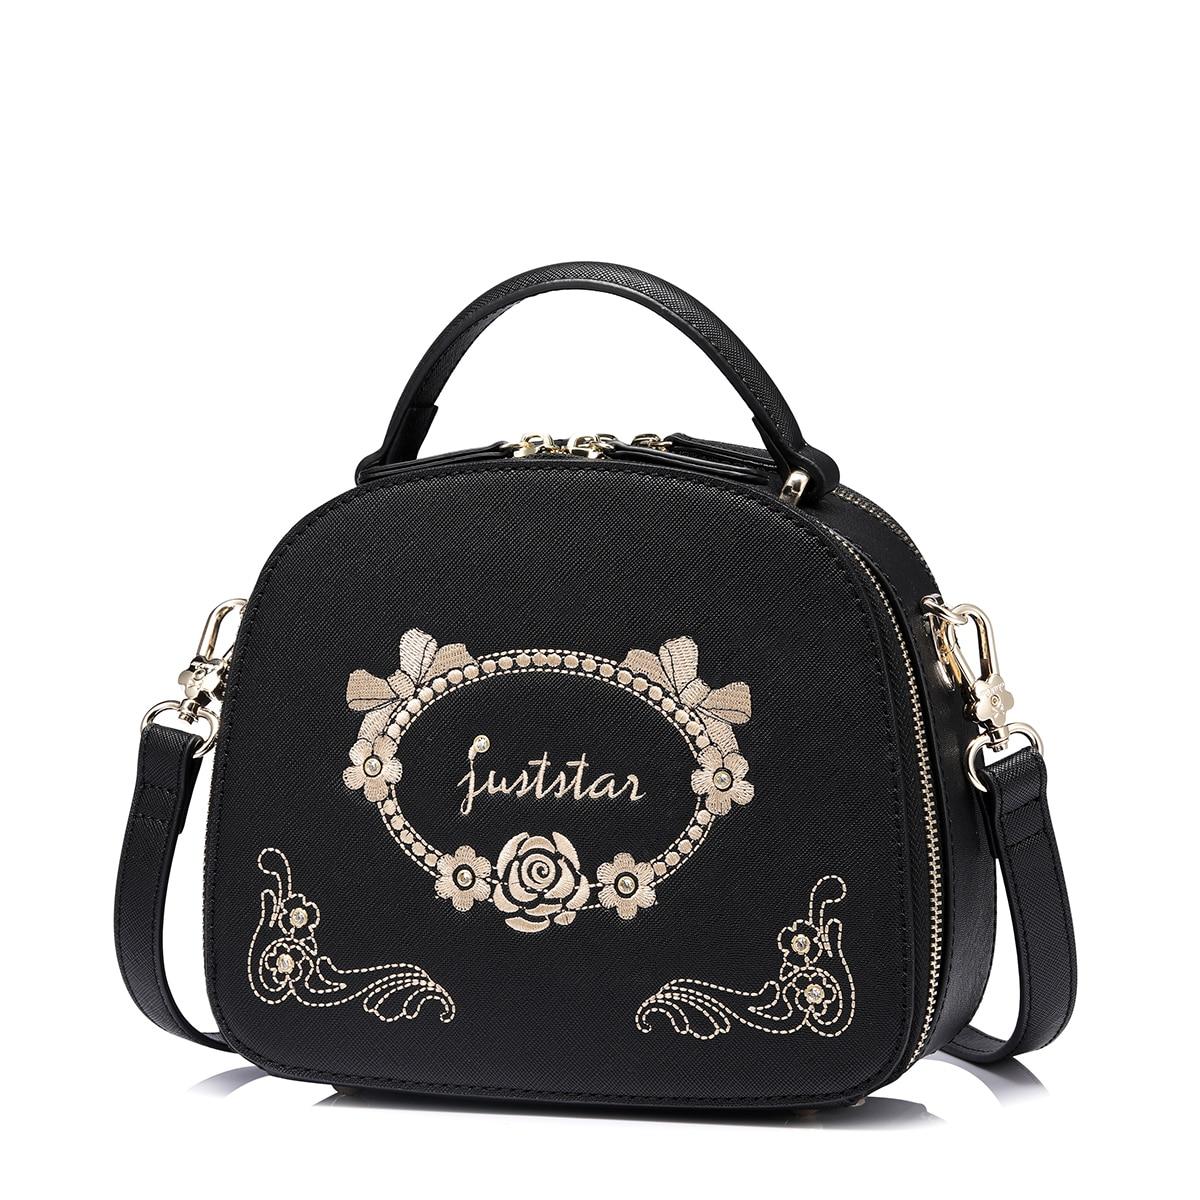 купить Luxuriant Embroidery Messenger Bag Flower Handbag Ladies Small Crossbody Bags Women Famous Brands Designers Shoulder Bags Girls по цене 2975.57 рублей